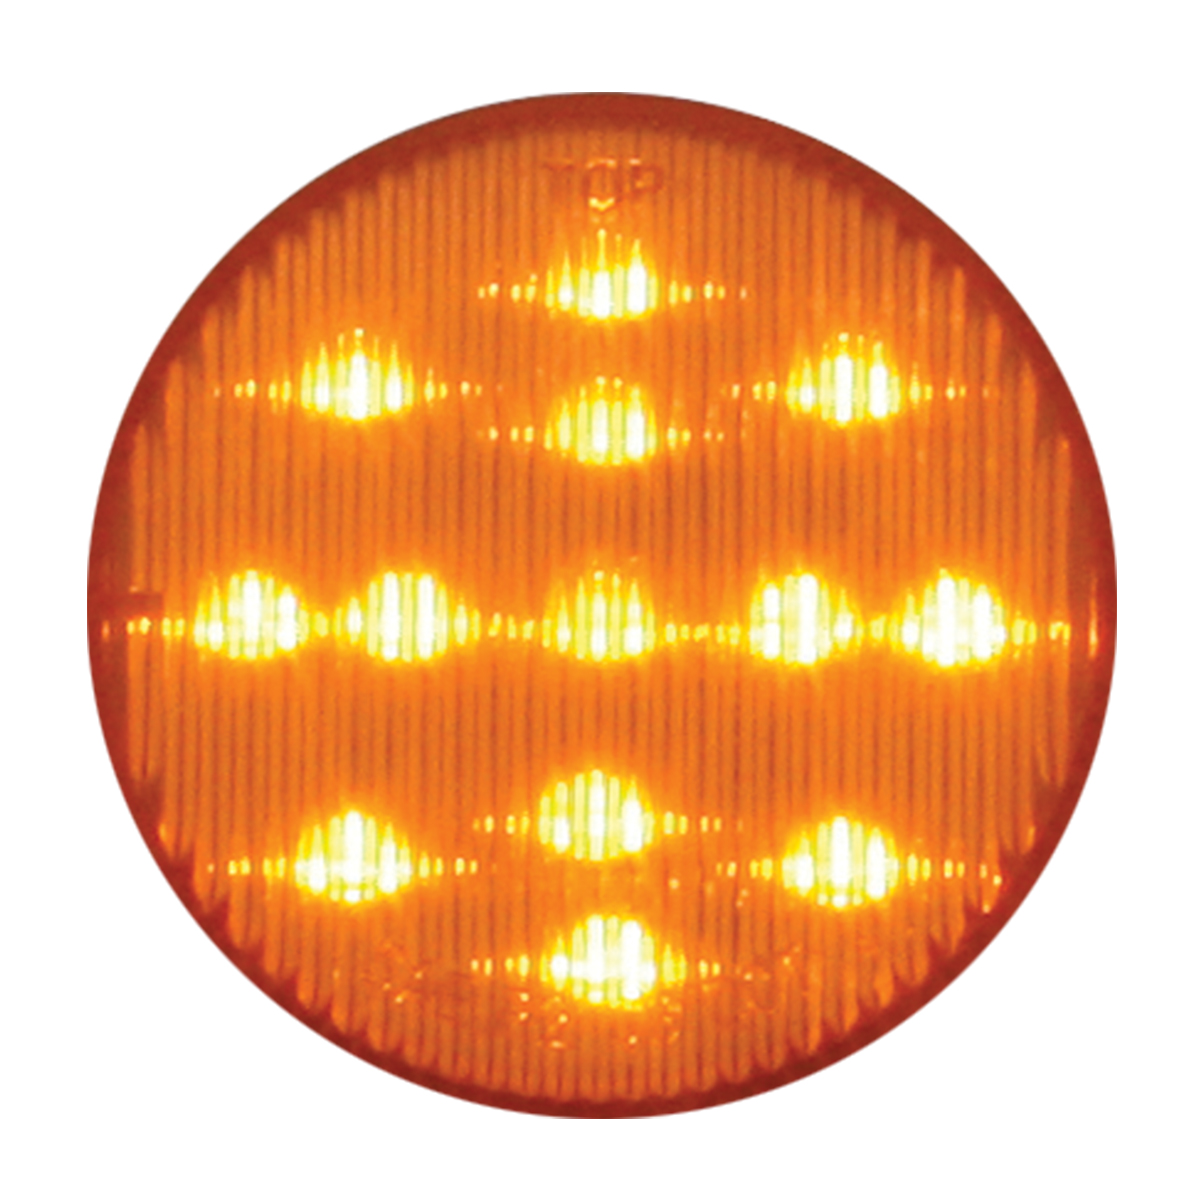 "#79310 2 ½"" Round LED Flat Amber/Amber Light"